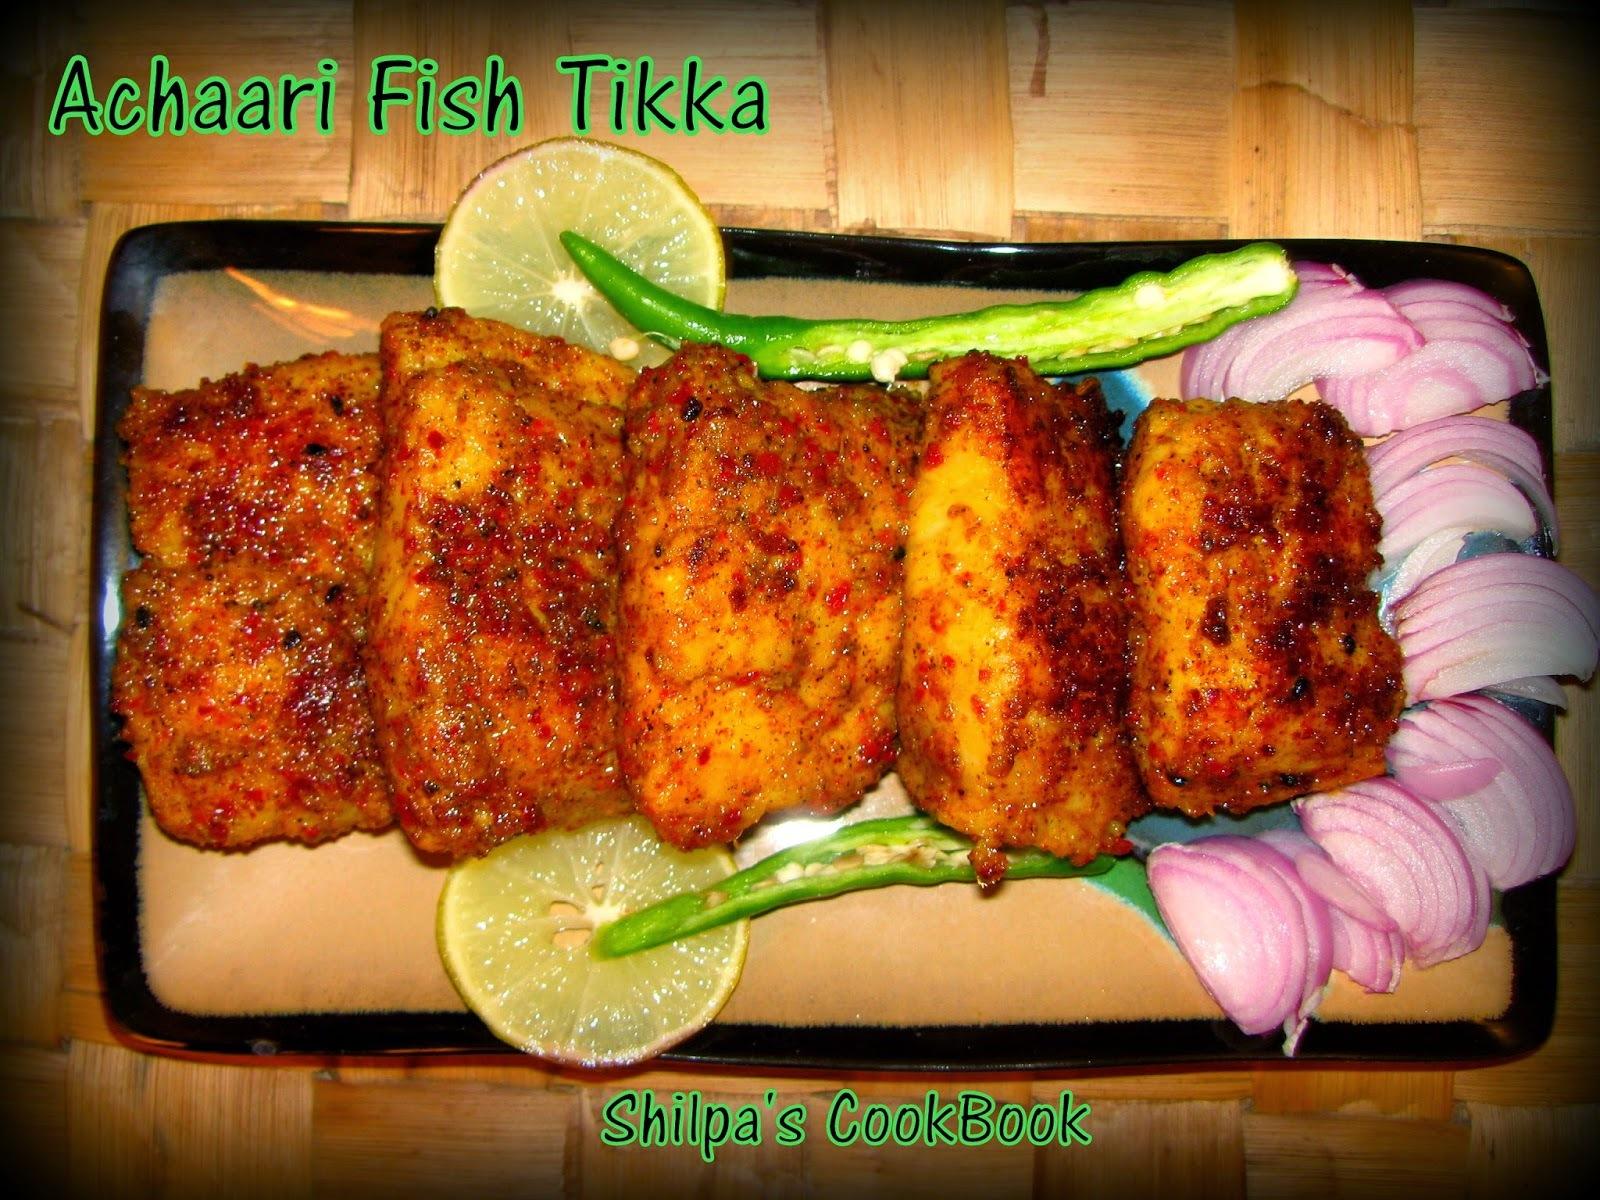 Achaari Fish Tikka